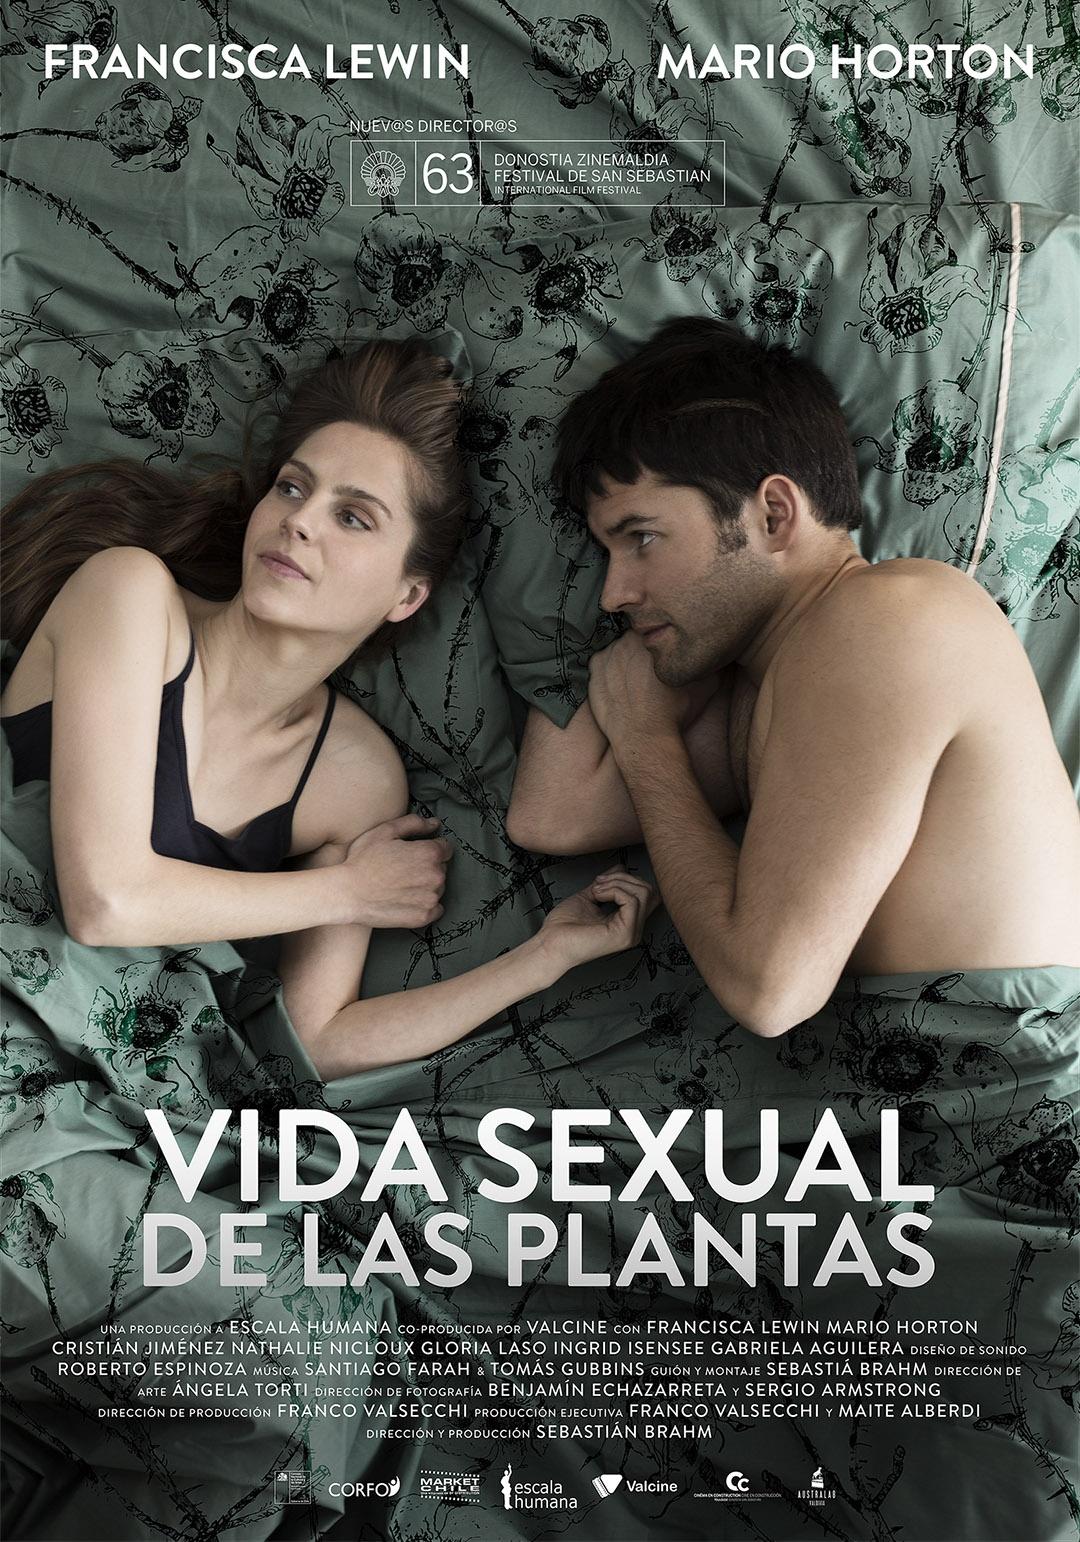 Ver Historia Sexual De O 1984 Online Completa,